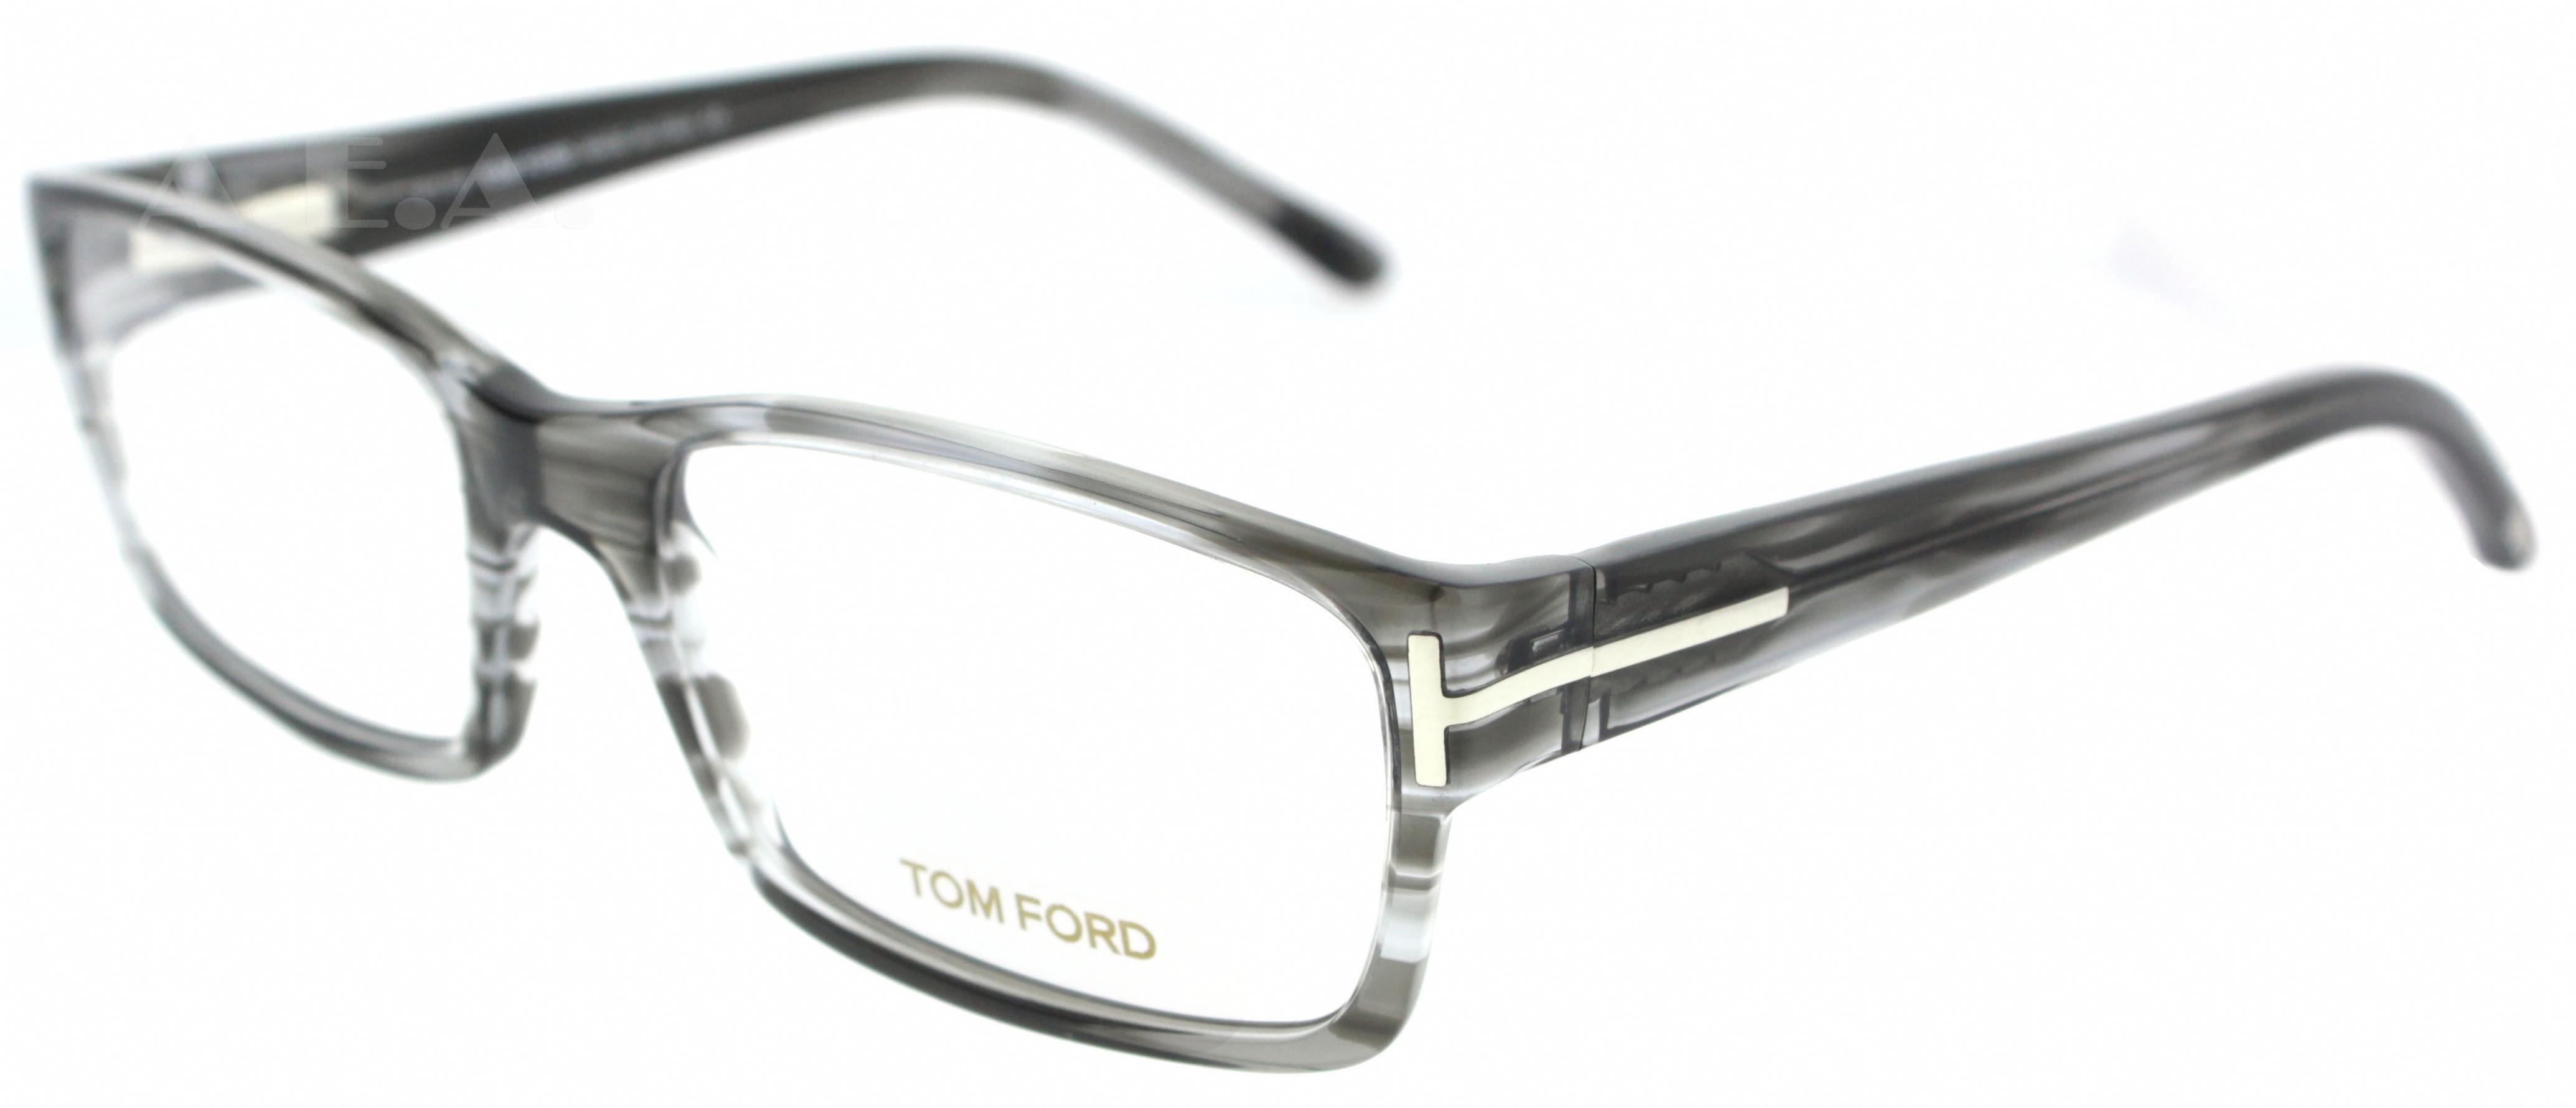 frame by ford pin tom eyeglasses